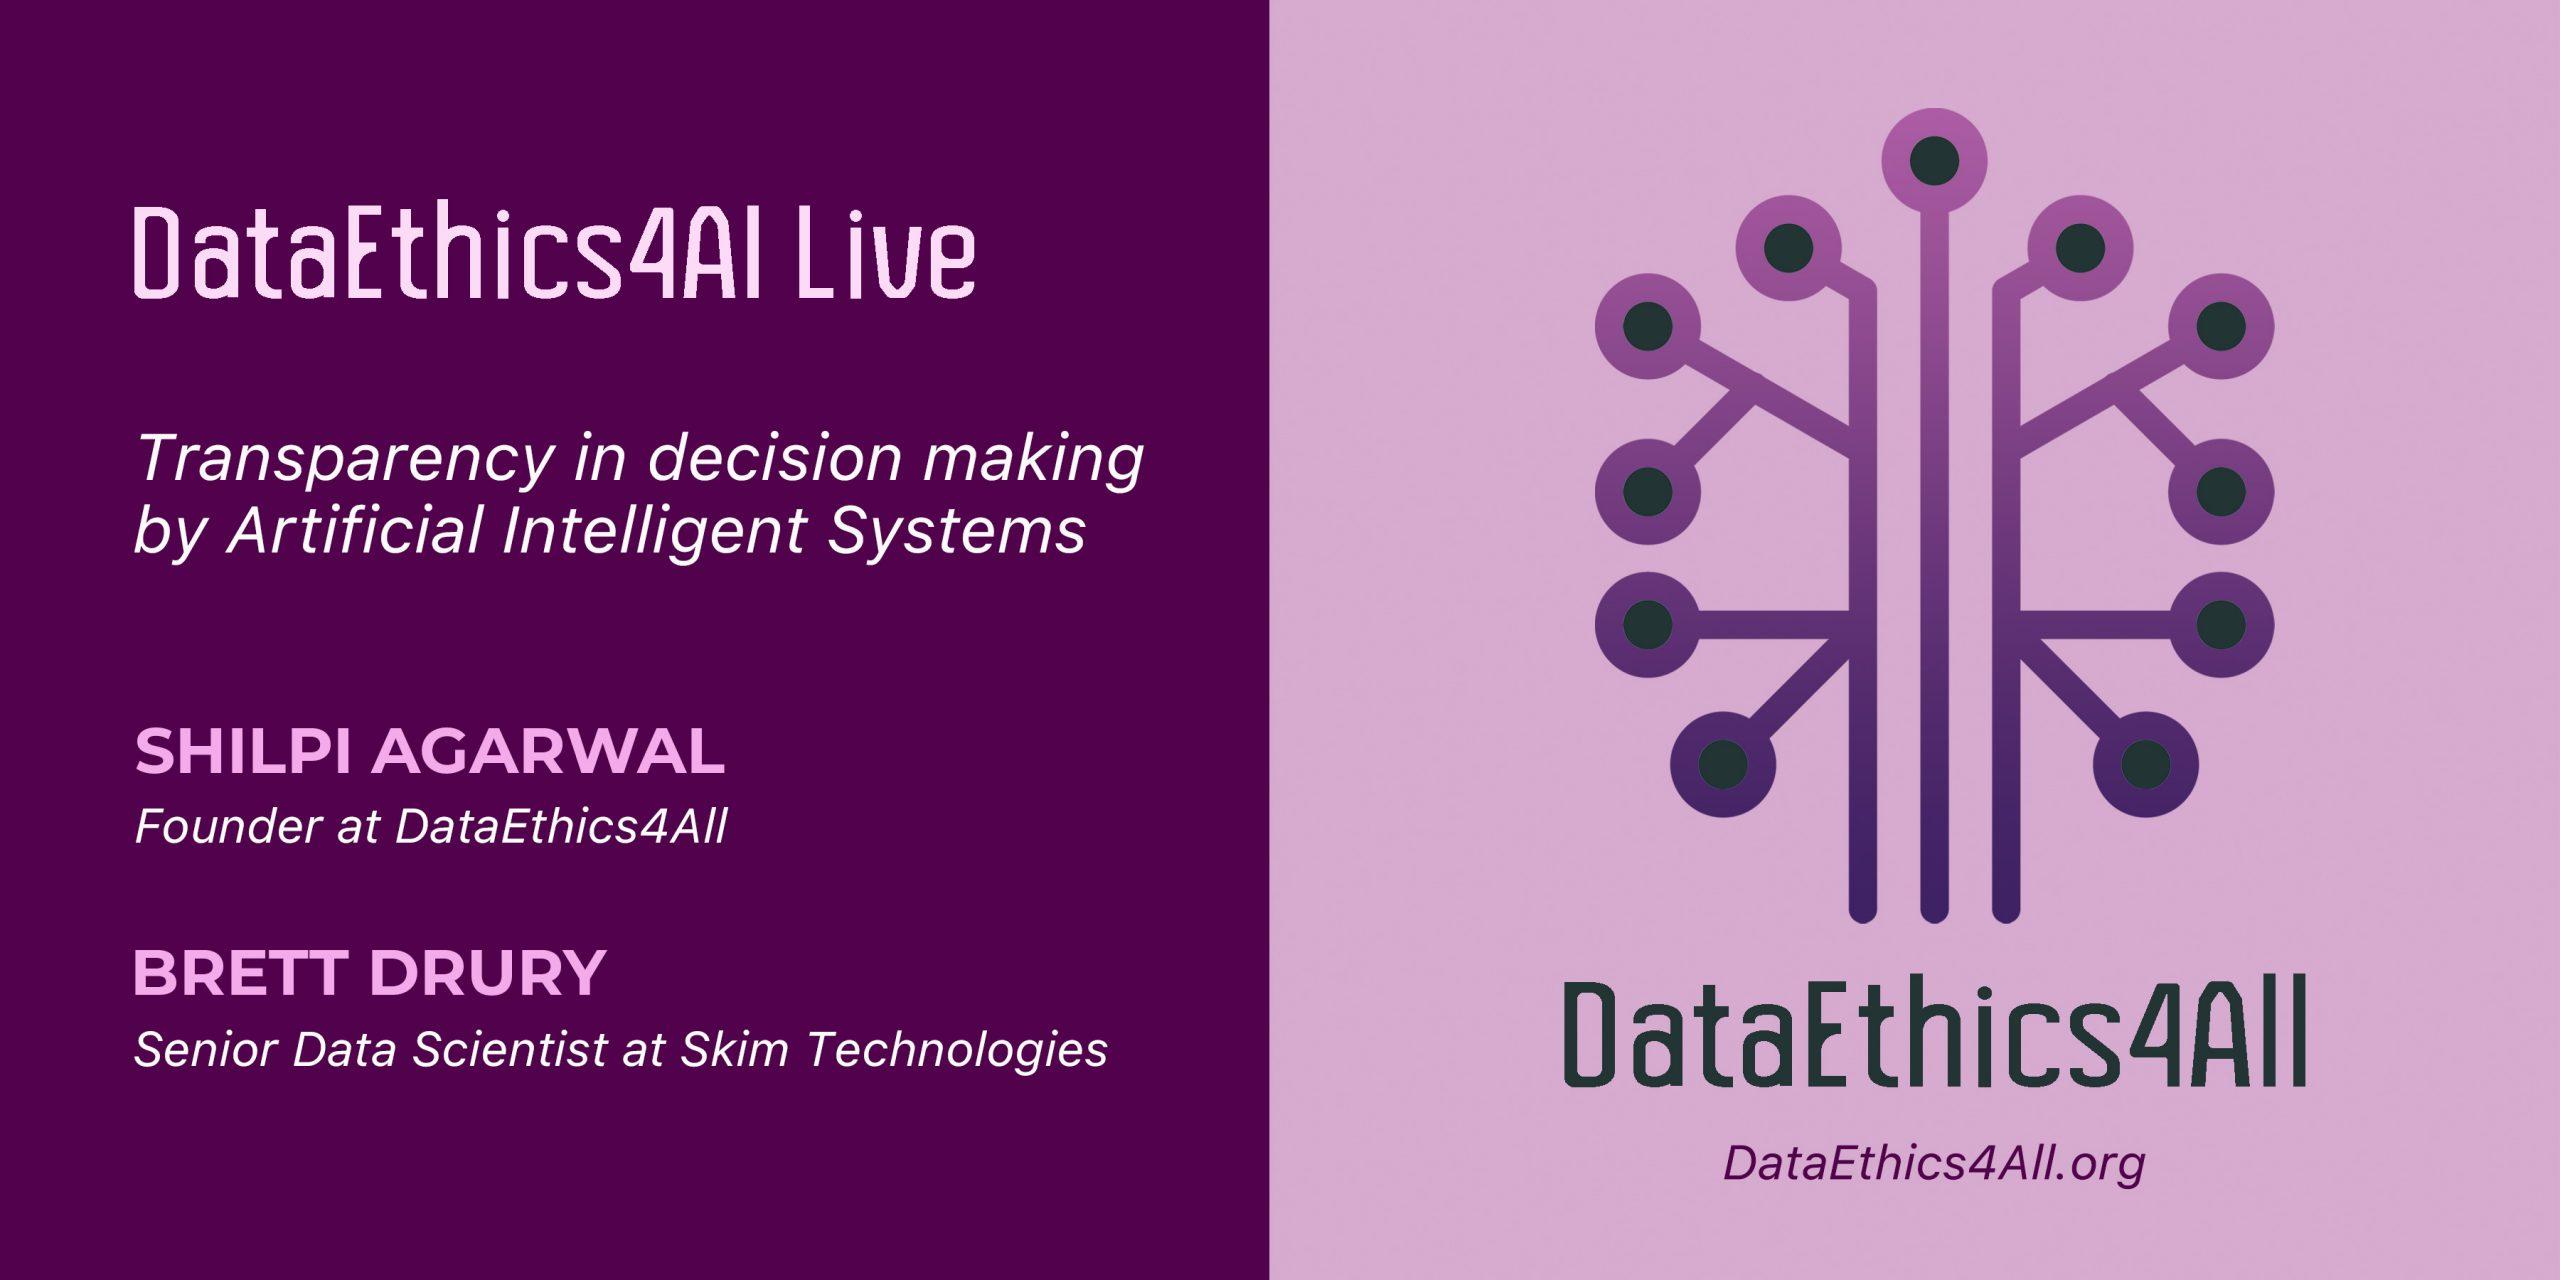 DataEthics4AI-Live-with-Brett-Drury